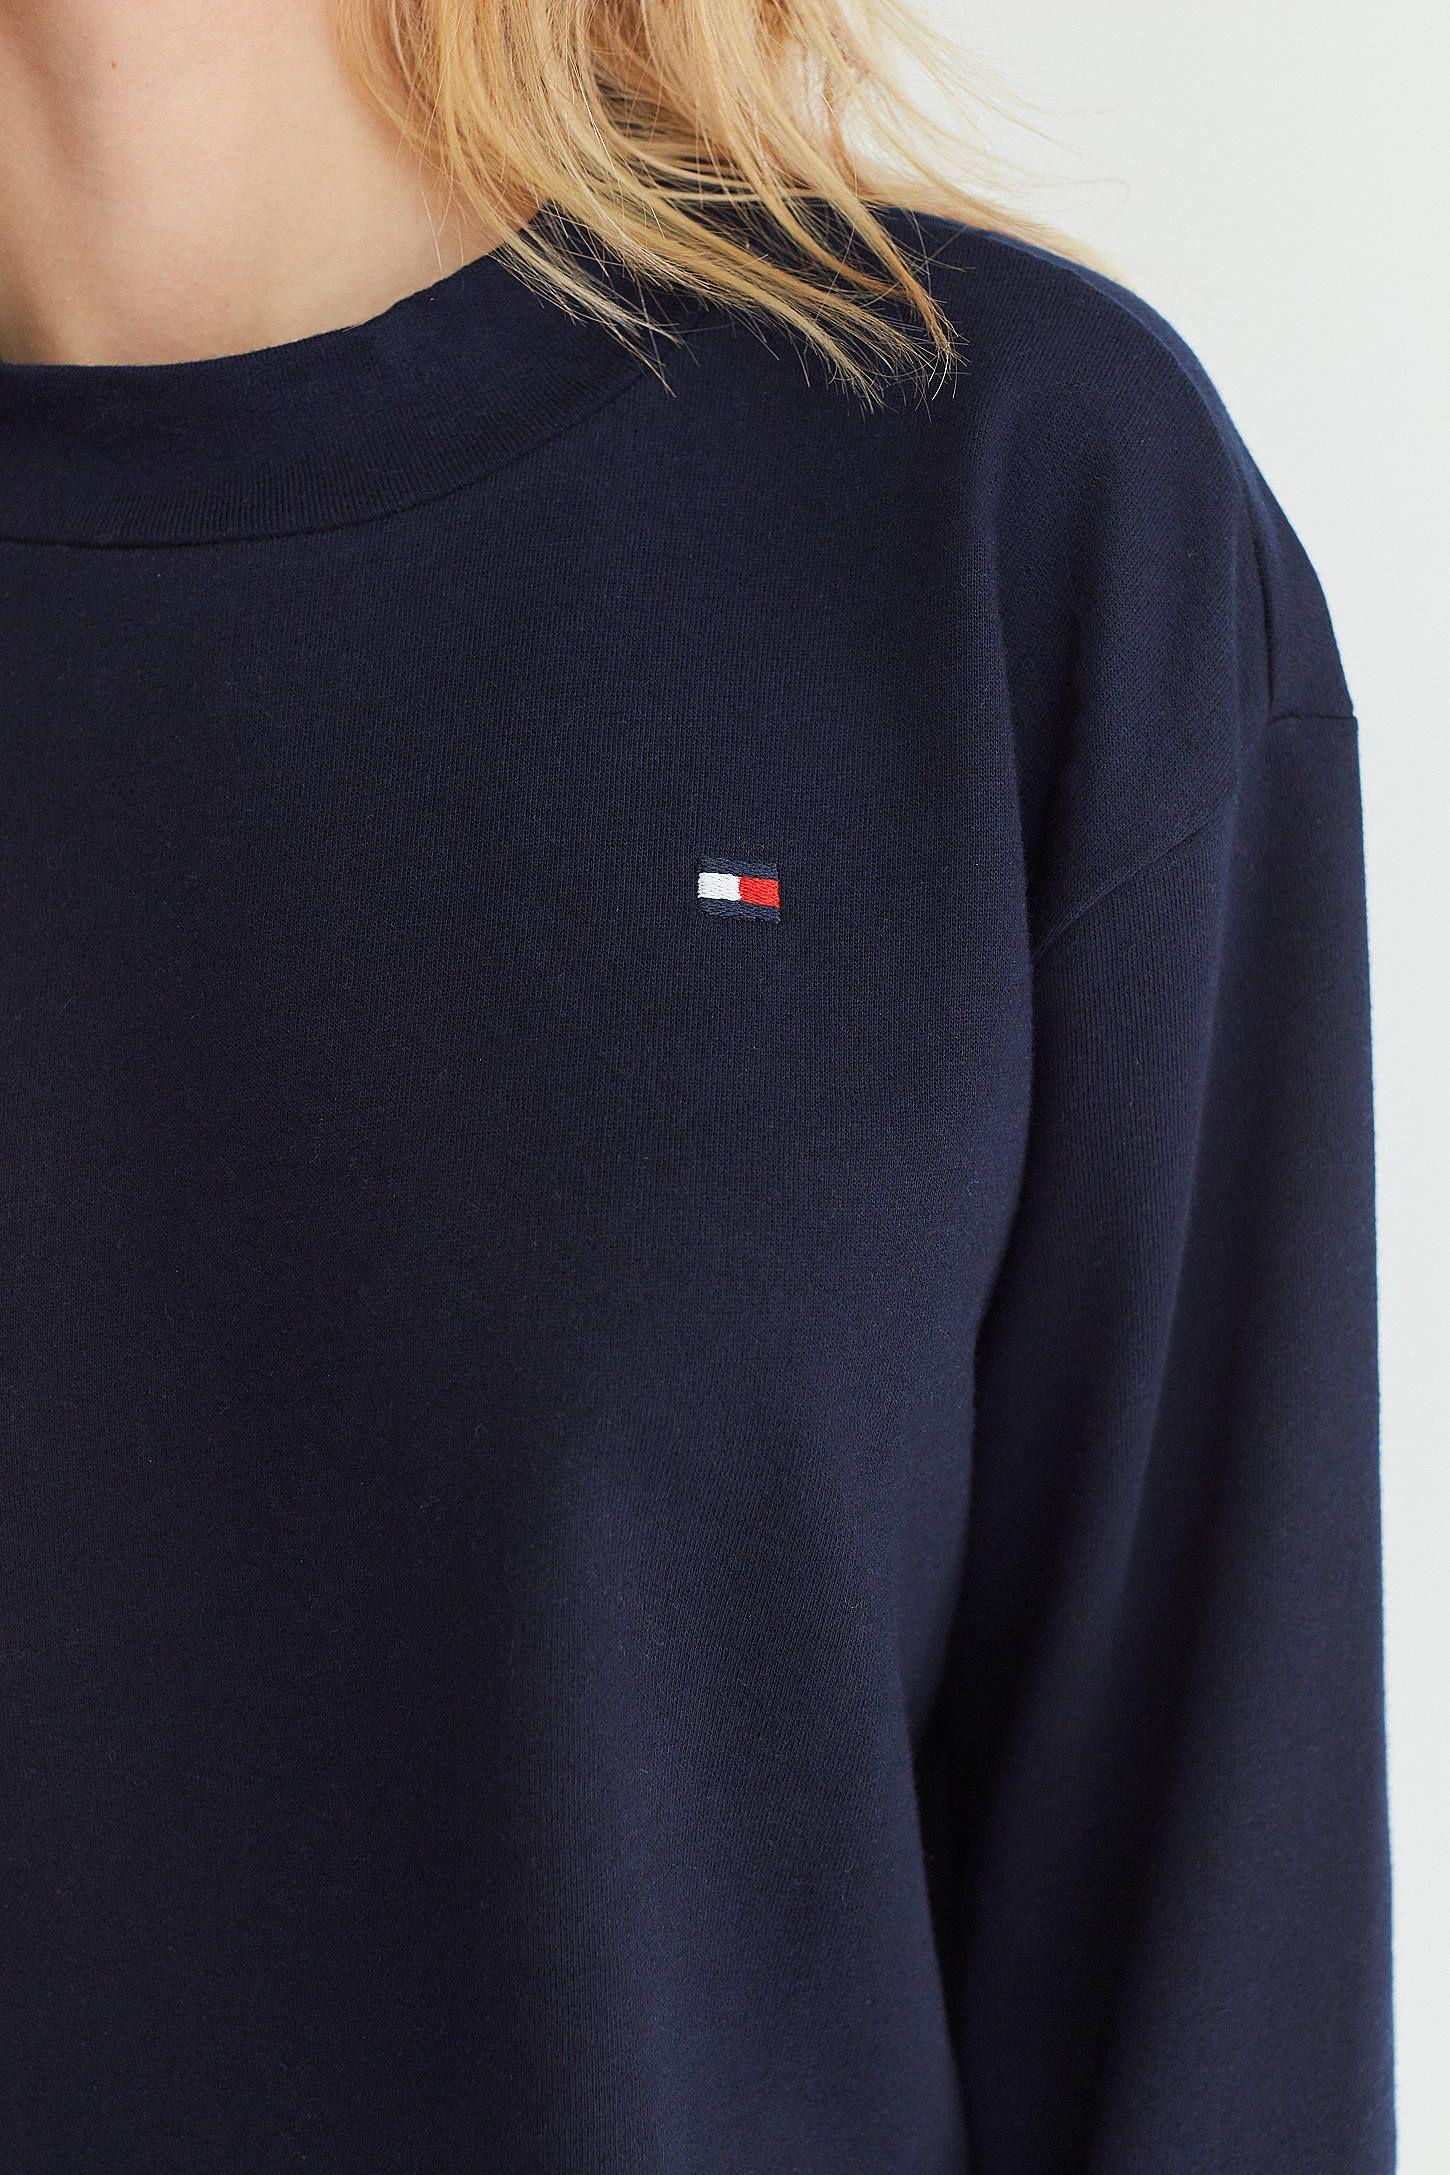 Tommy Hilfiger UO Exclusive Mock Neck Pullover Sweatshirt